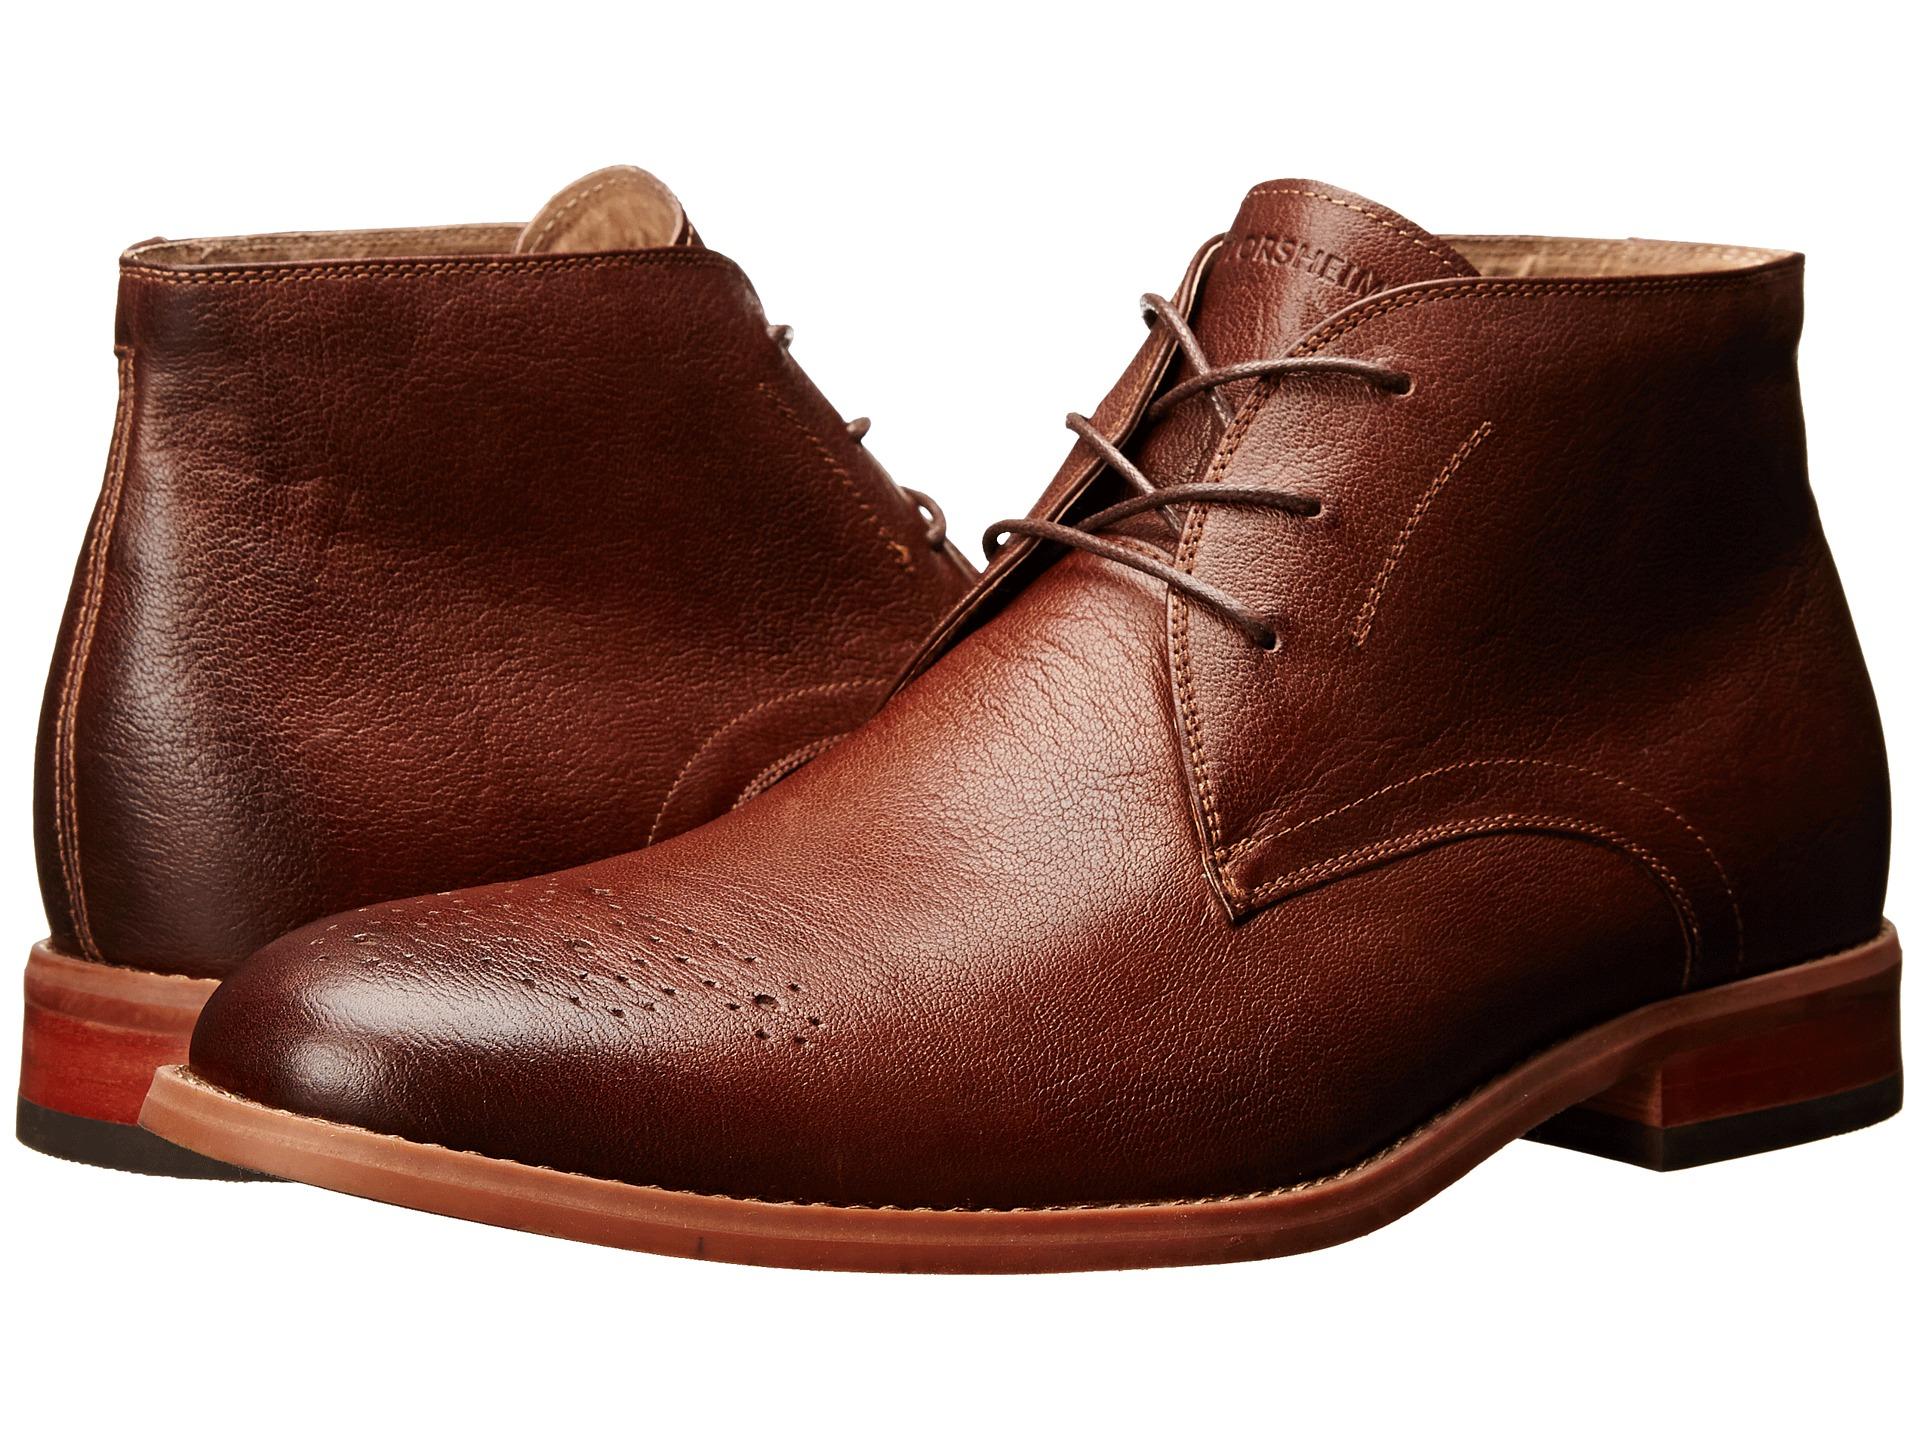 Florsheim Rockit Chukka Boot In Brown For Men Lyst